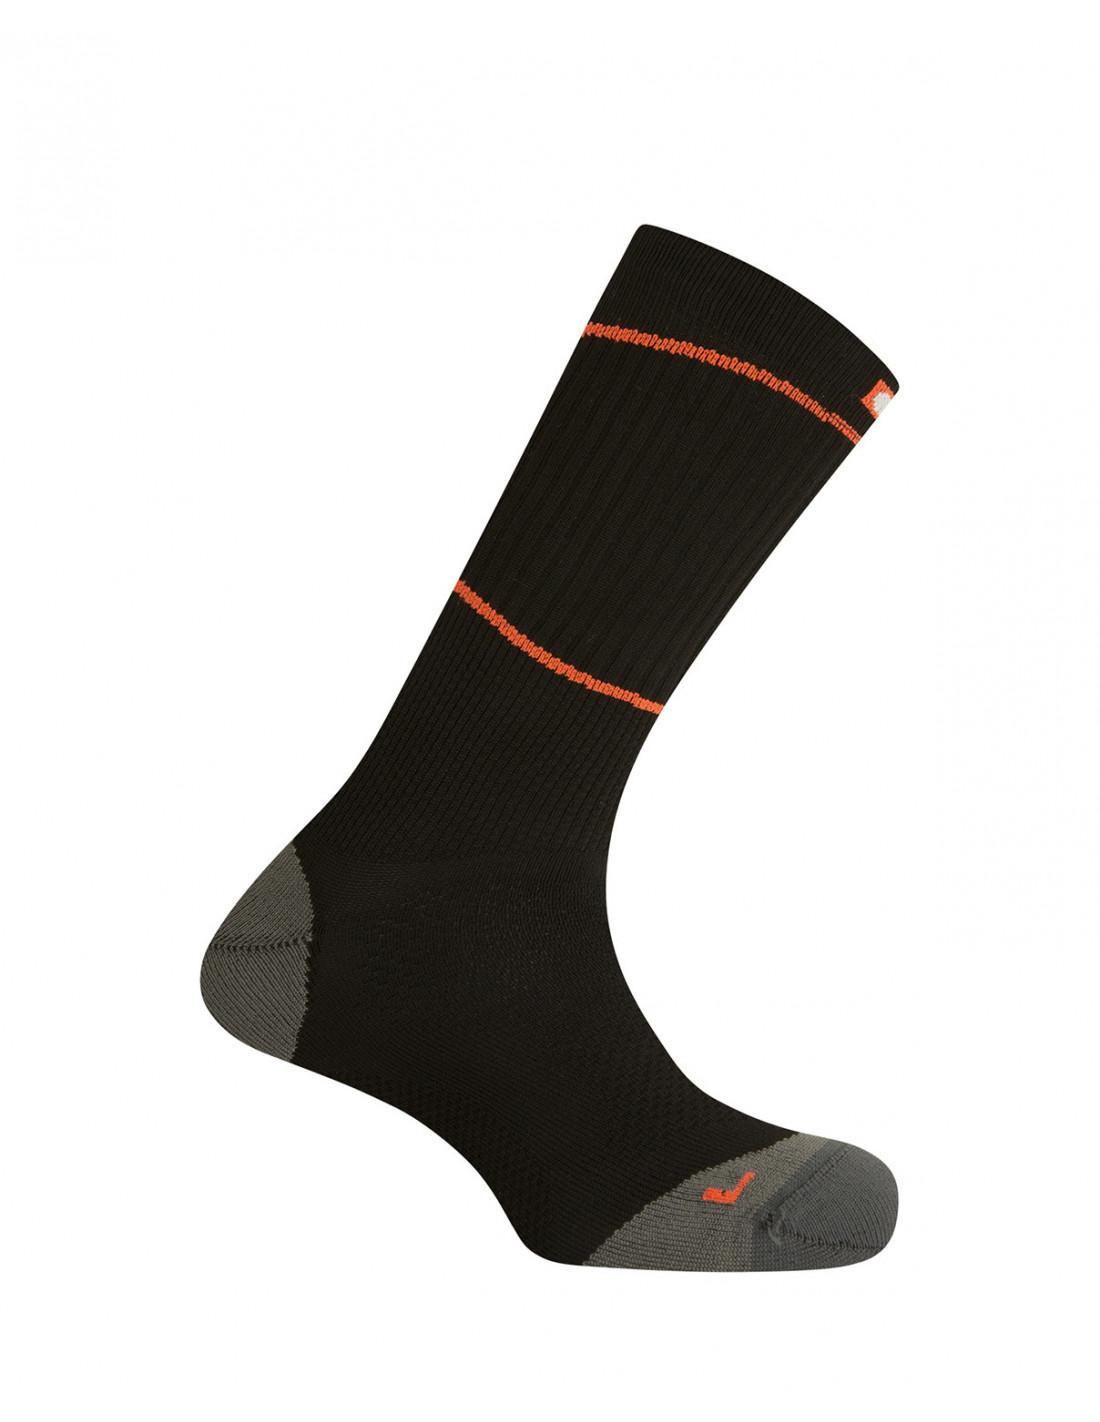 Paddle socks